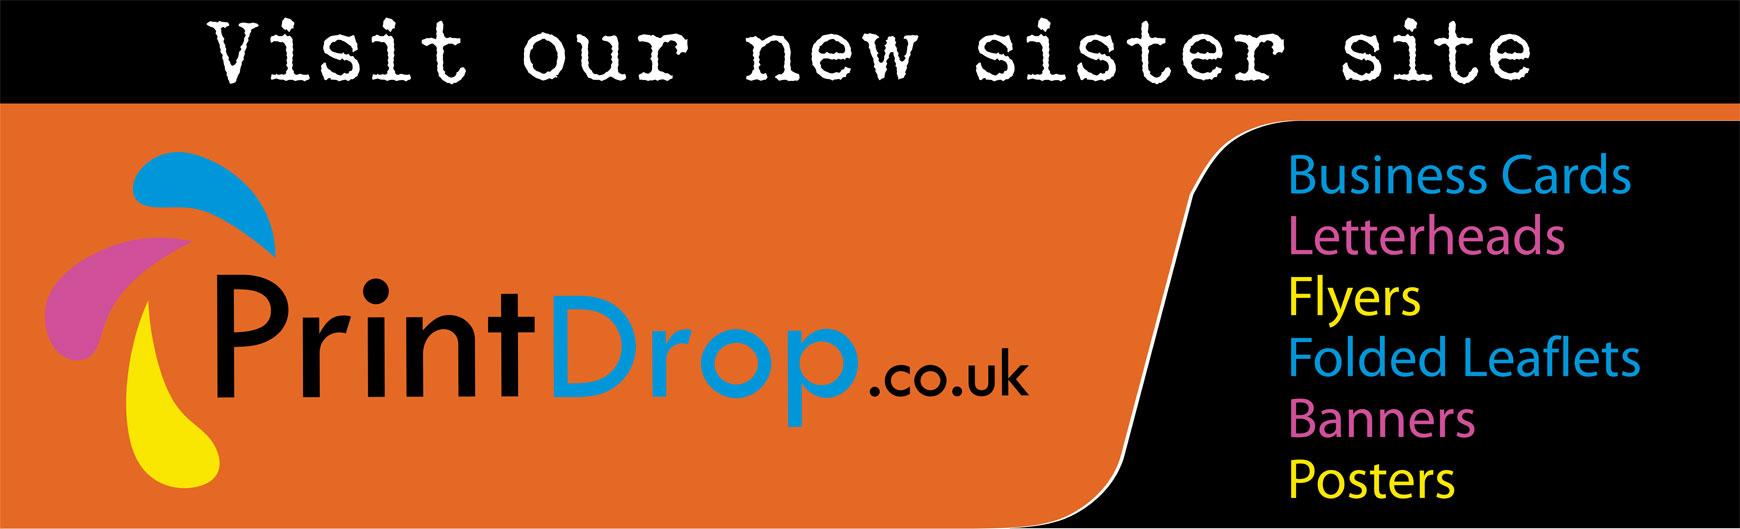 printdrop.co.uk